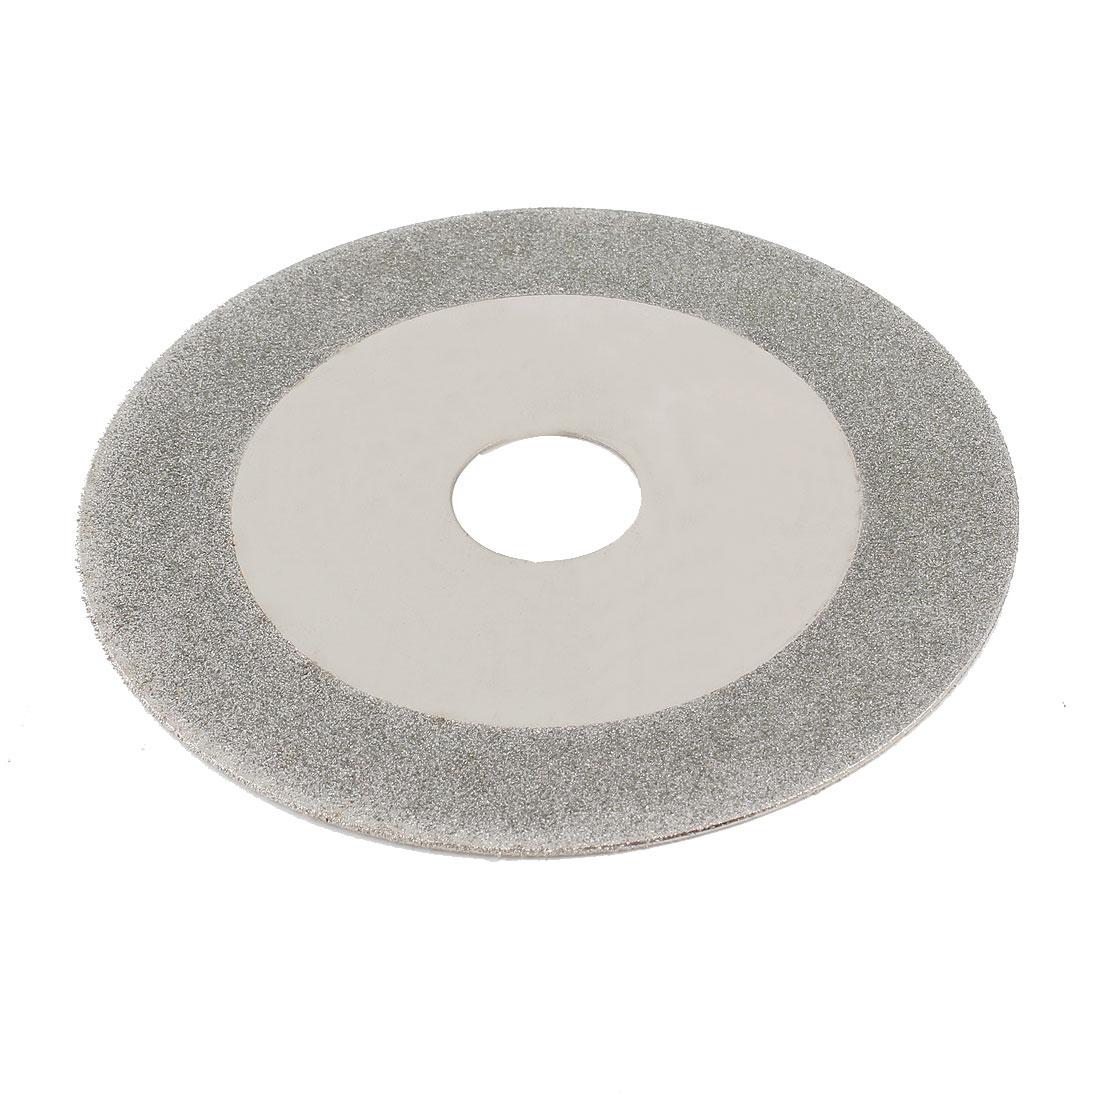 100mm x 20mm Grinding Tool Diamond Cutting Wheel Disc Silver Tone